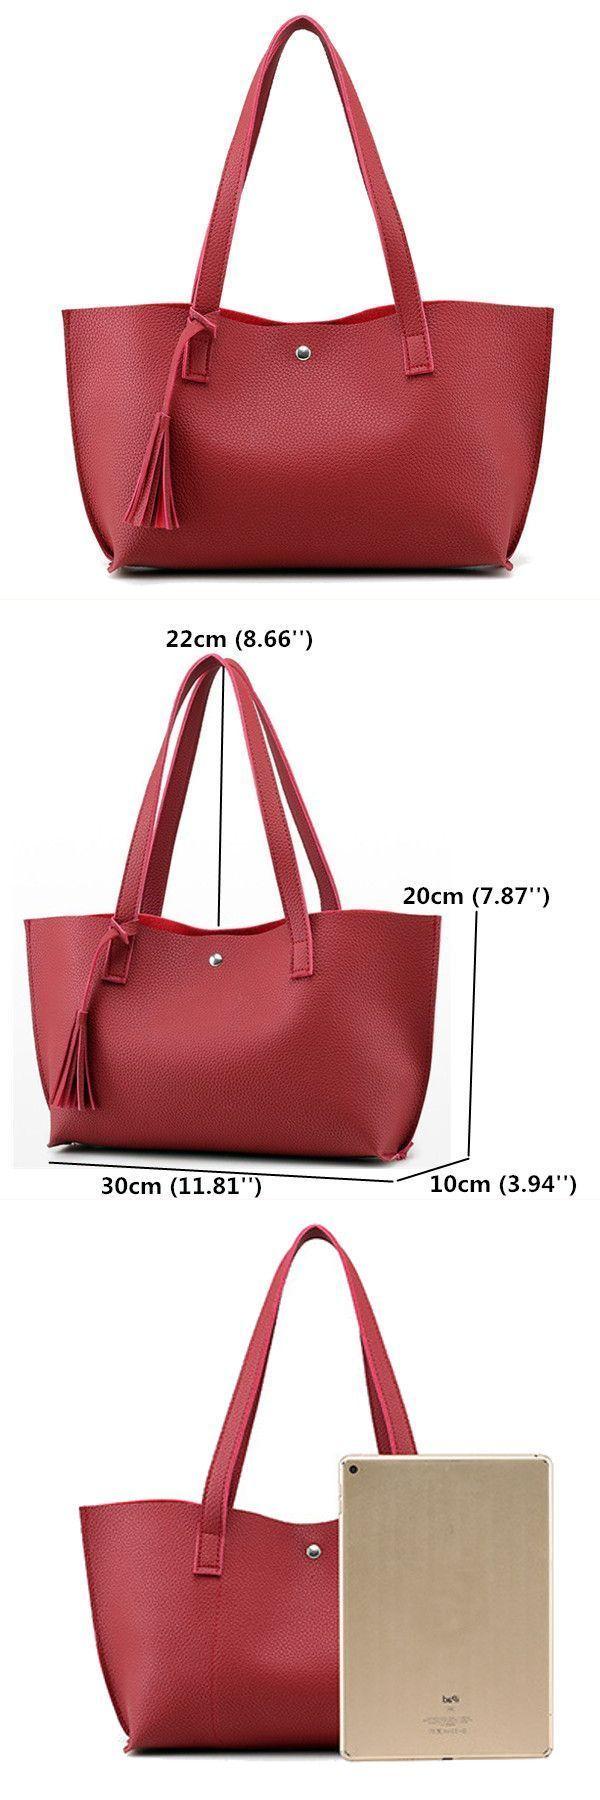 25 Unique Handbag Organizer Ideas On Pinterest Handbag